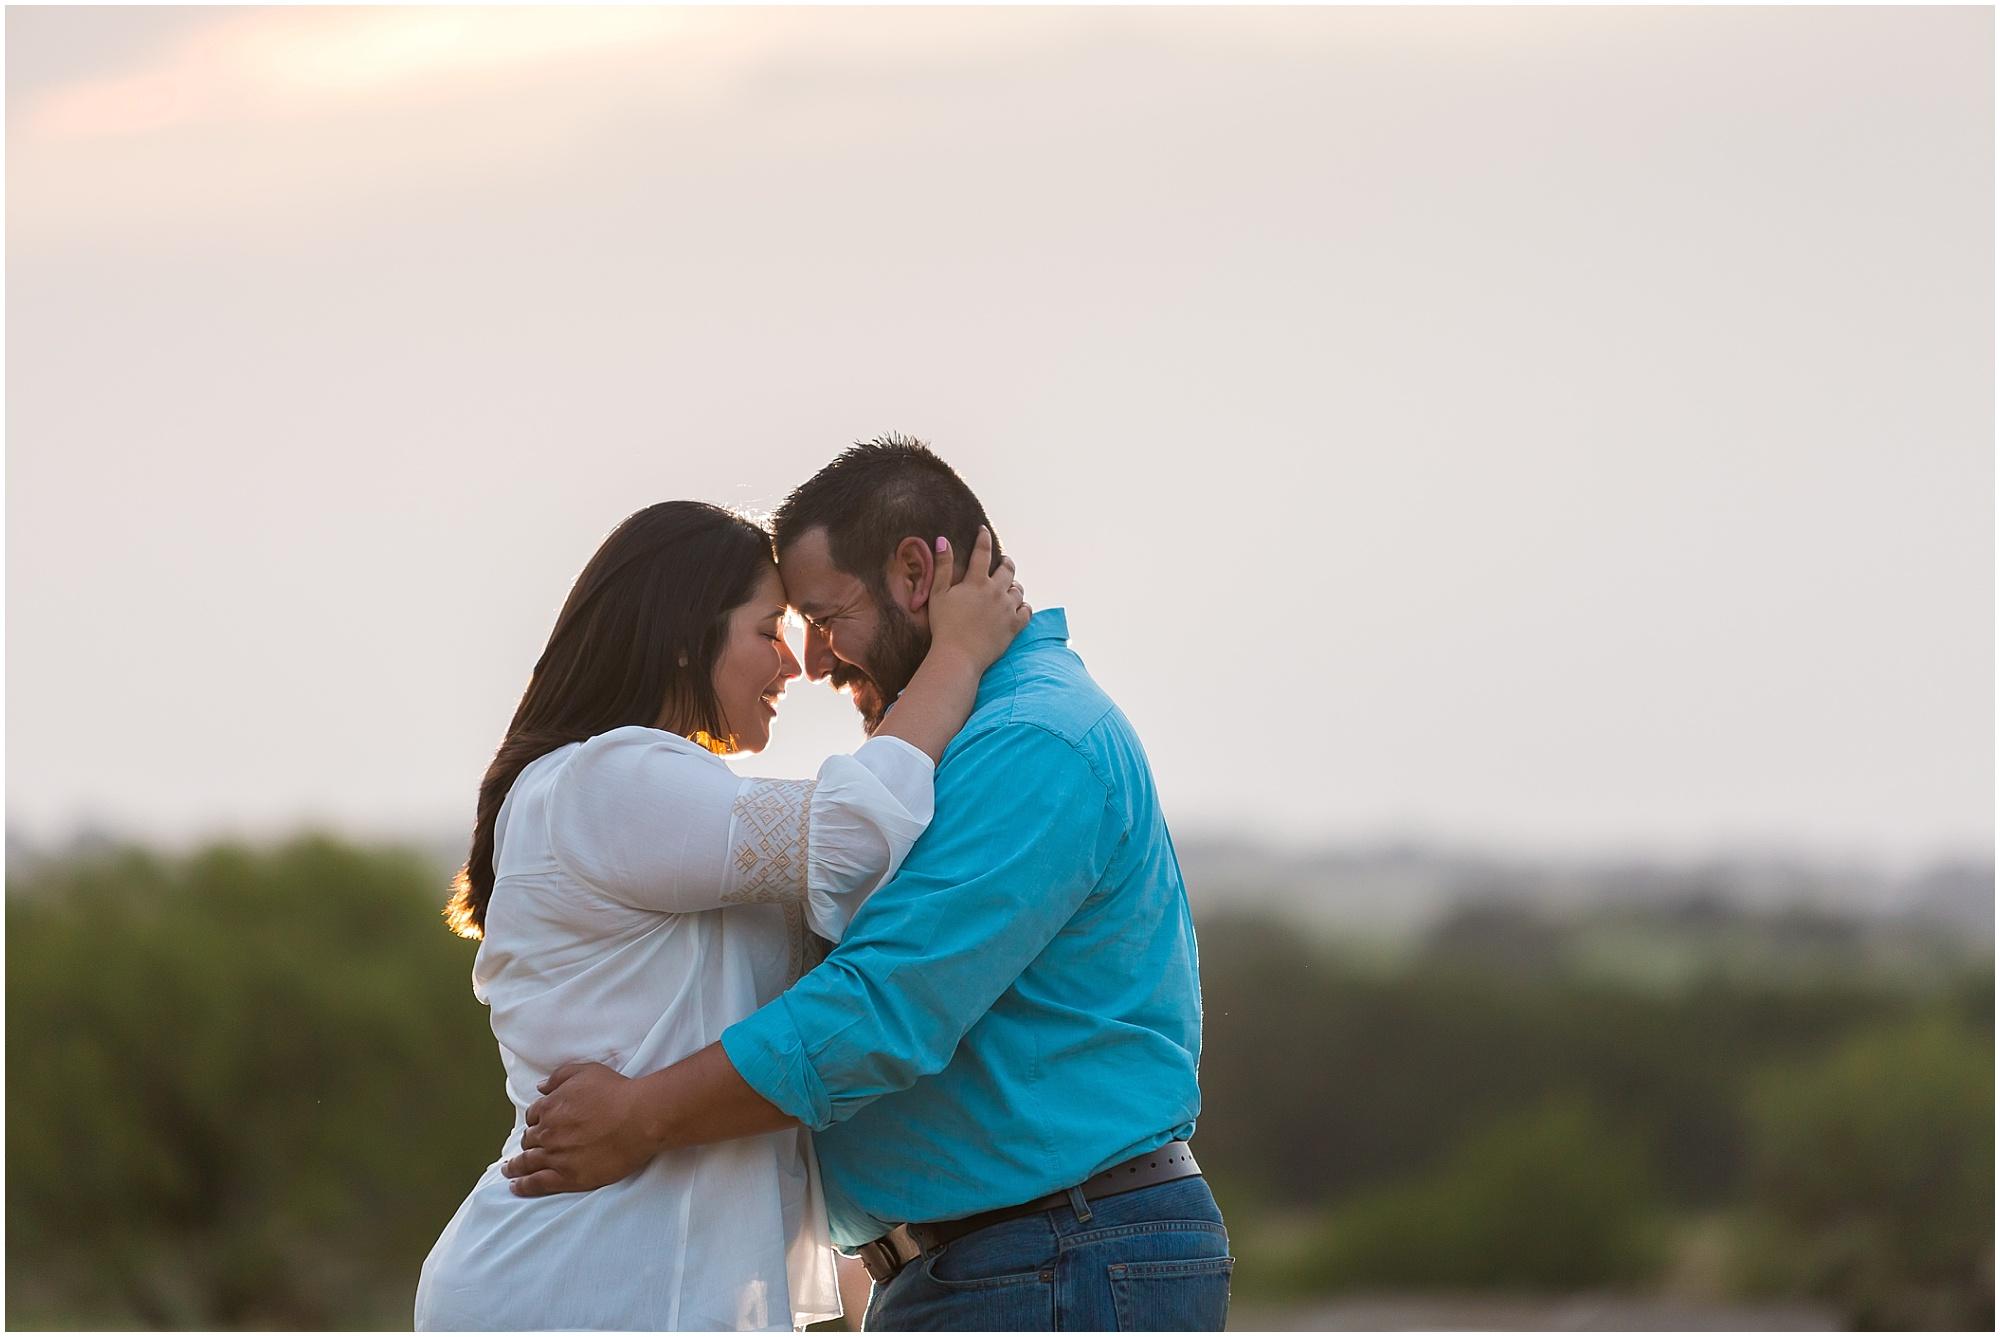 Romantic engagement portraits on a family ranch in Dublin, TX - Jason & Melaina Photography - www.jasonandmelaina.com